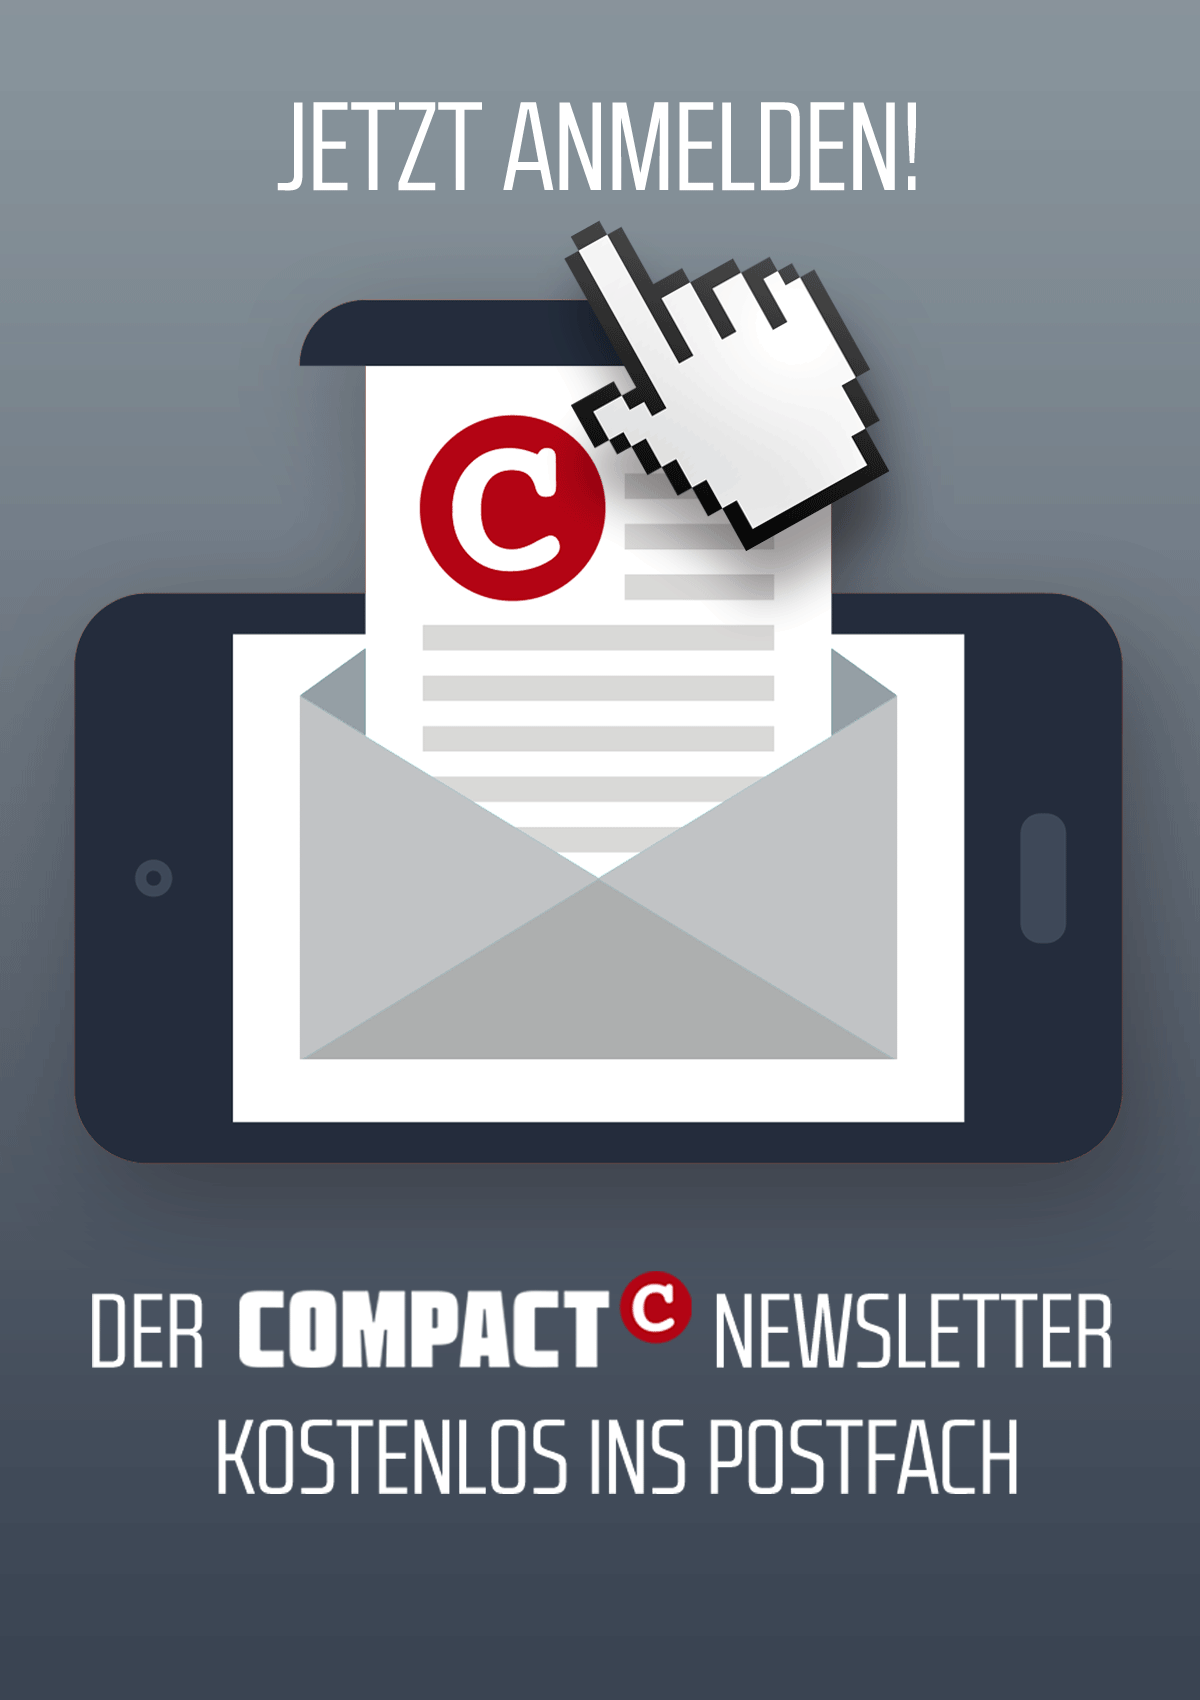 COMPACT - Newsletter, jetzt anmelden!